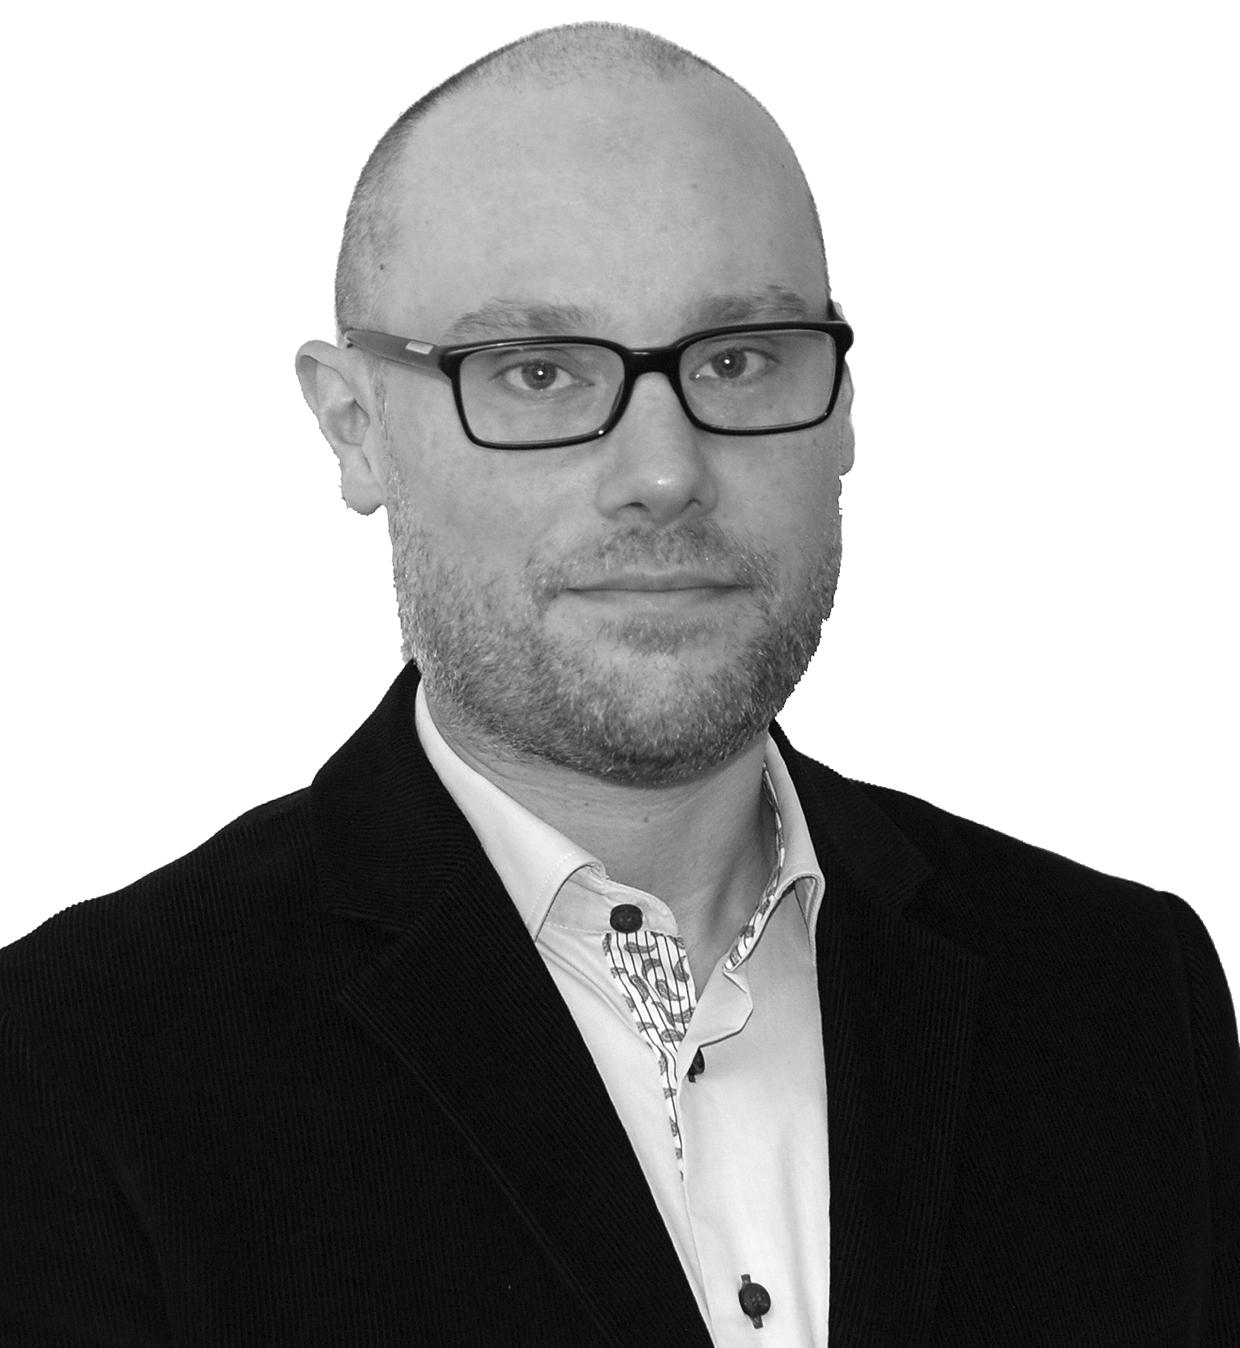 Henrik Edberg